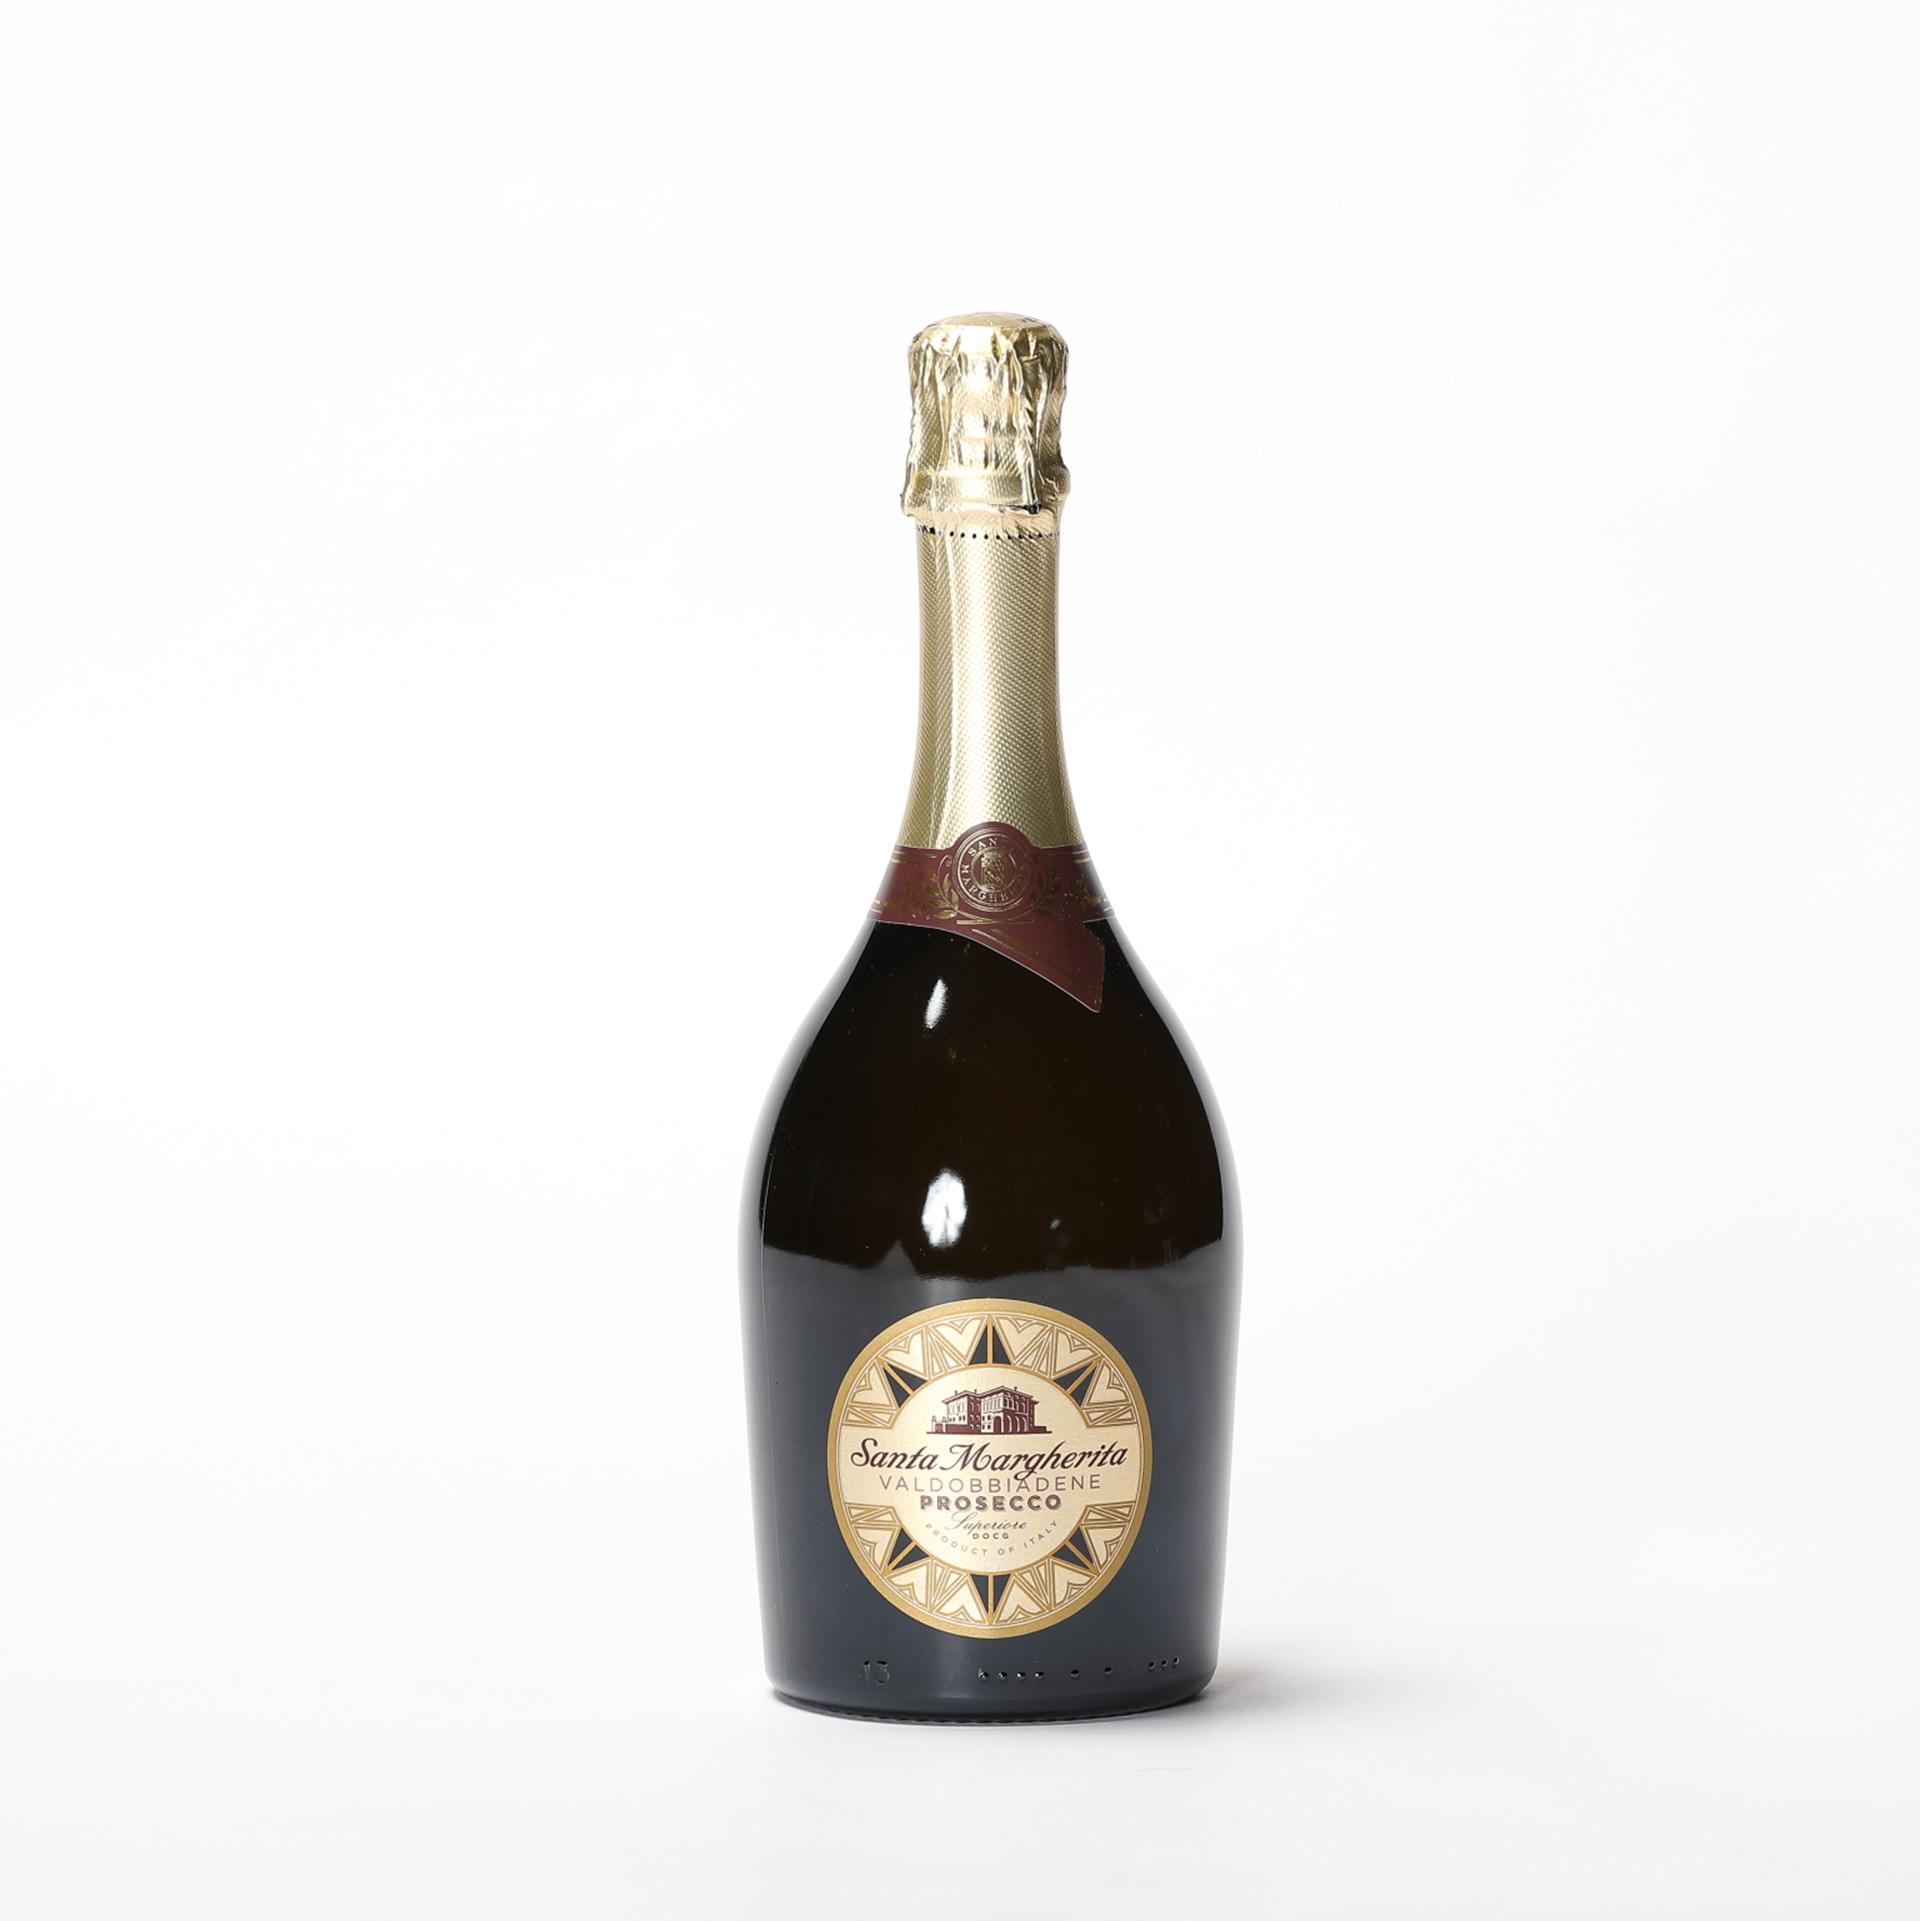 Prosecco di Valdobbiadene Spumante Brut - Weingut Santa Margherita